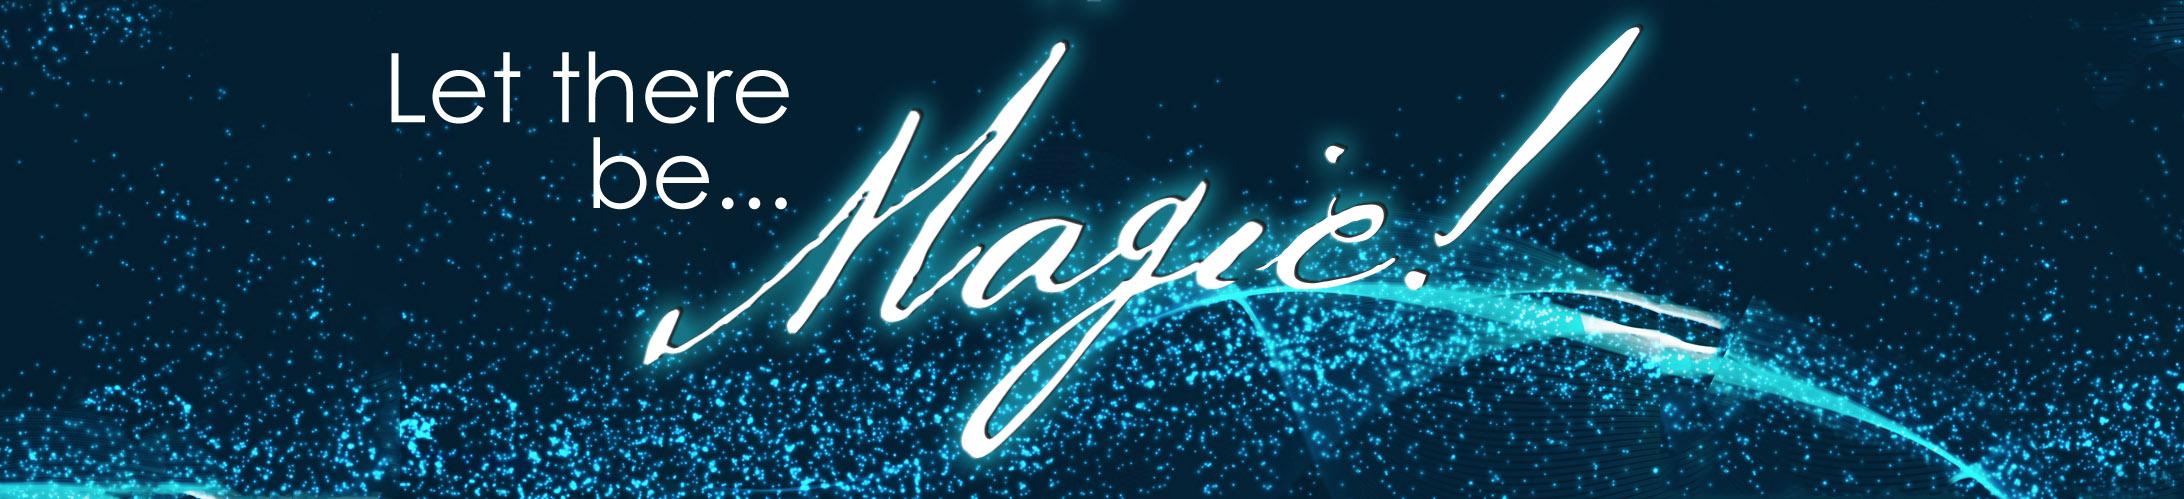 magic banner.jpg